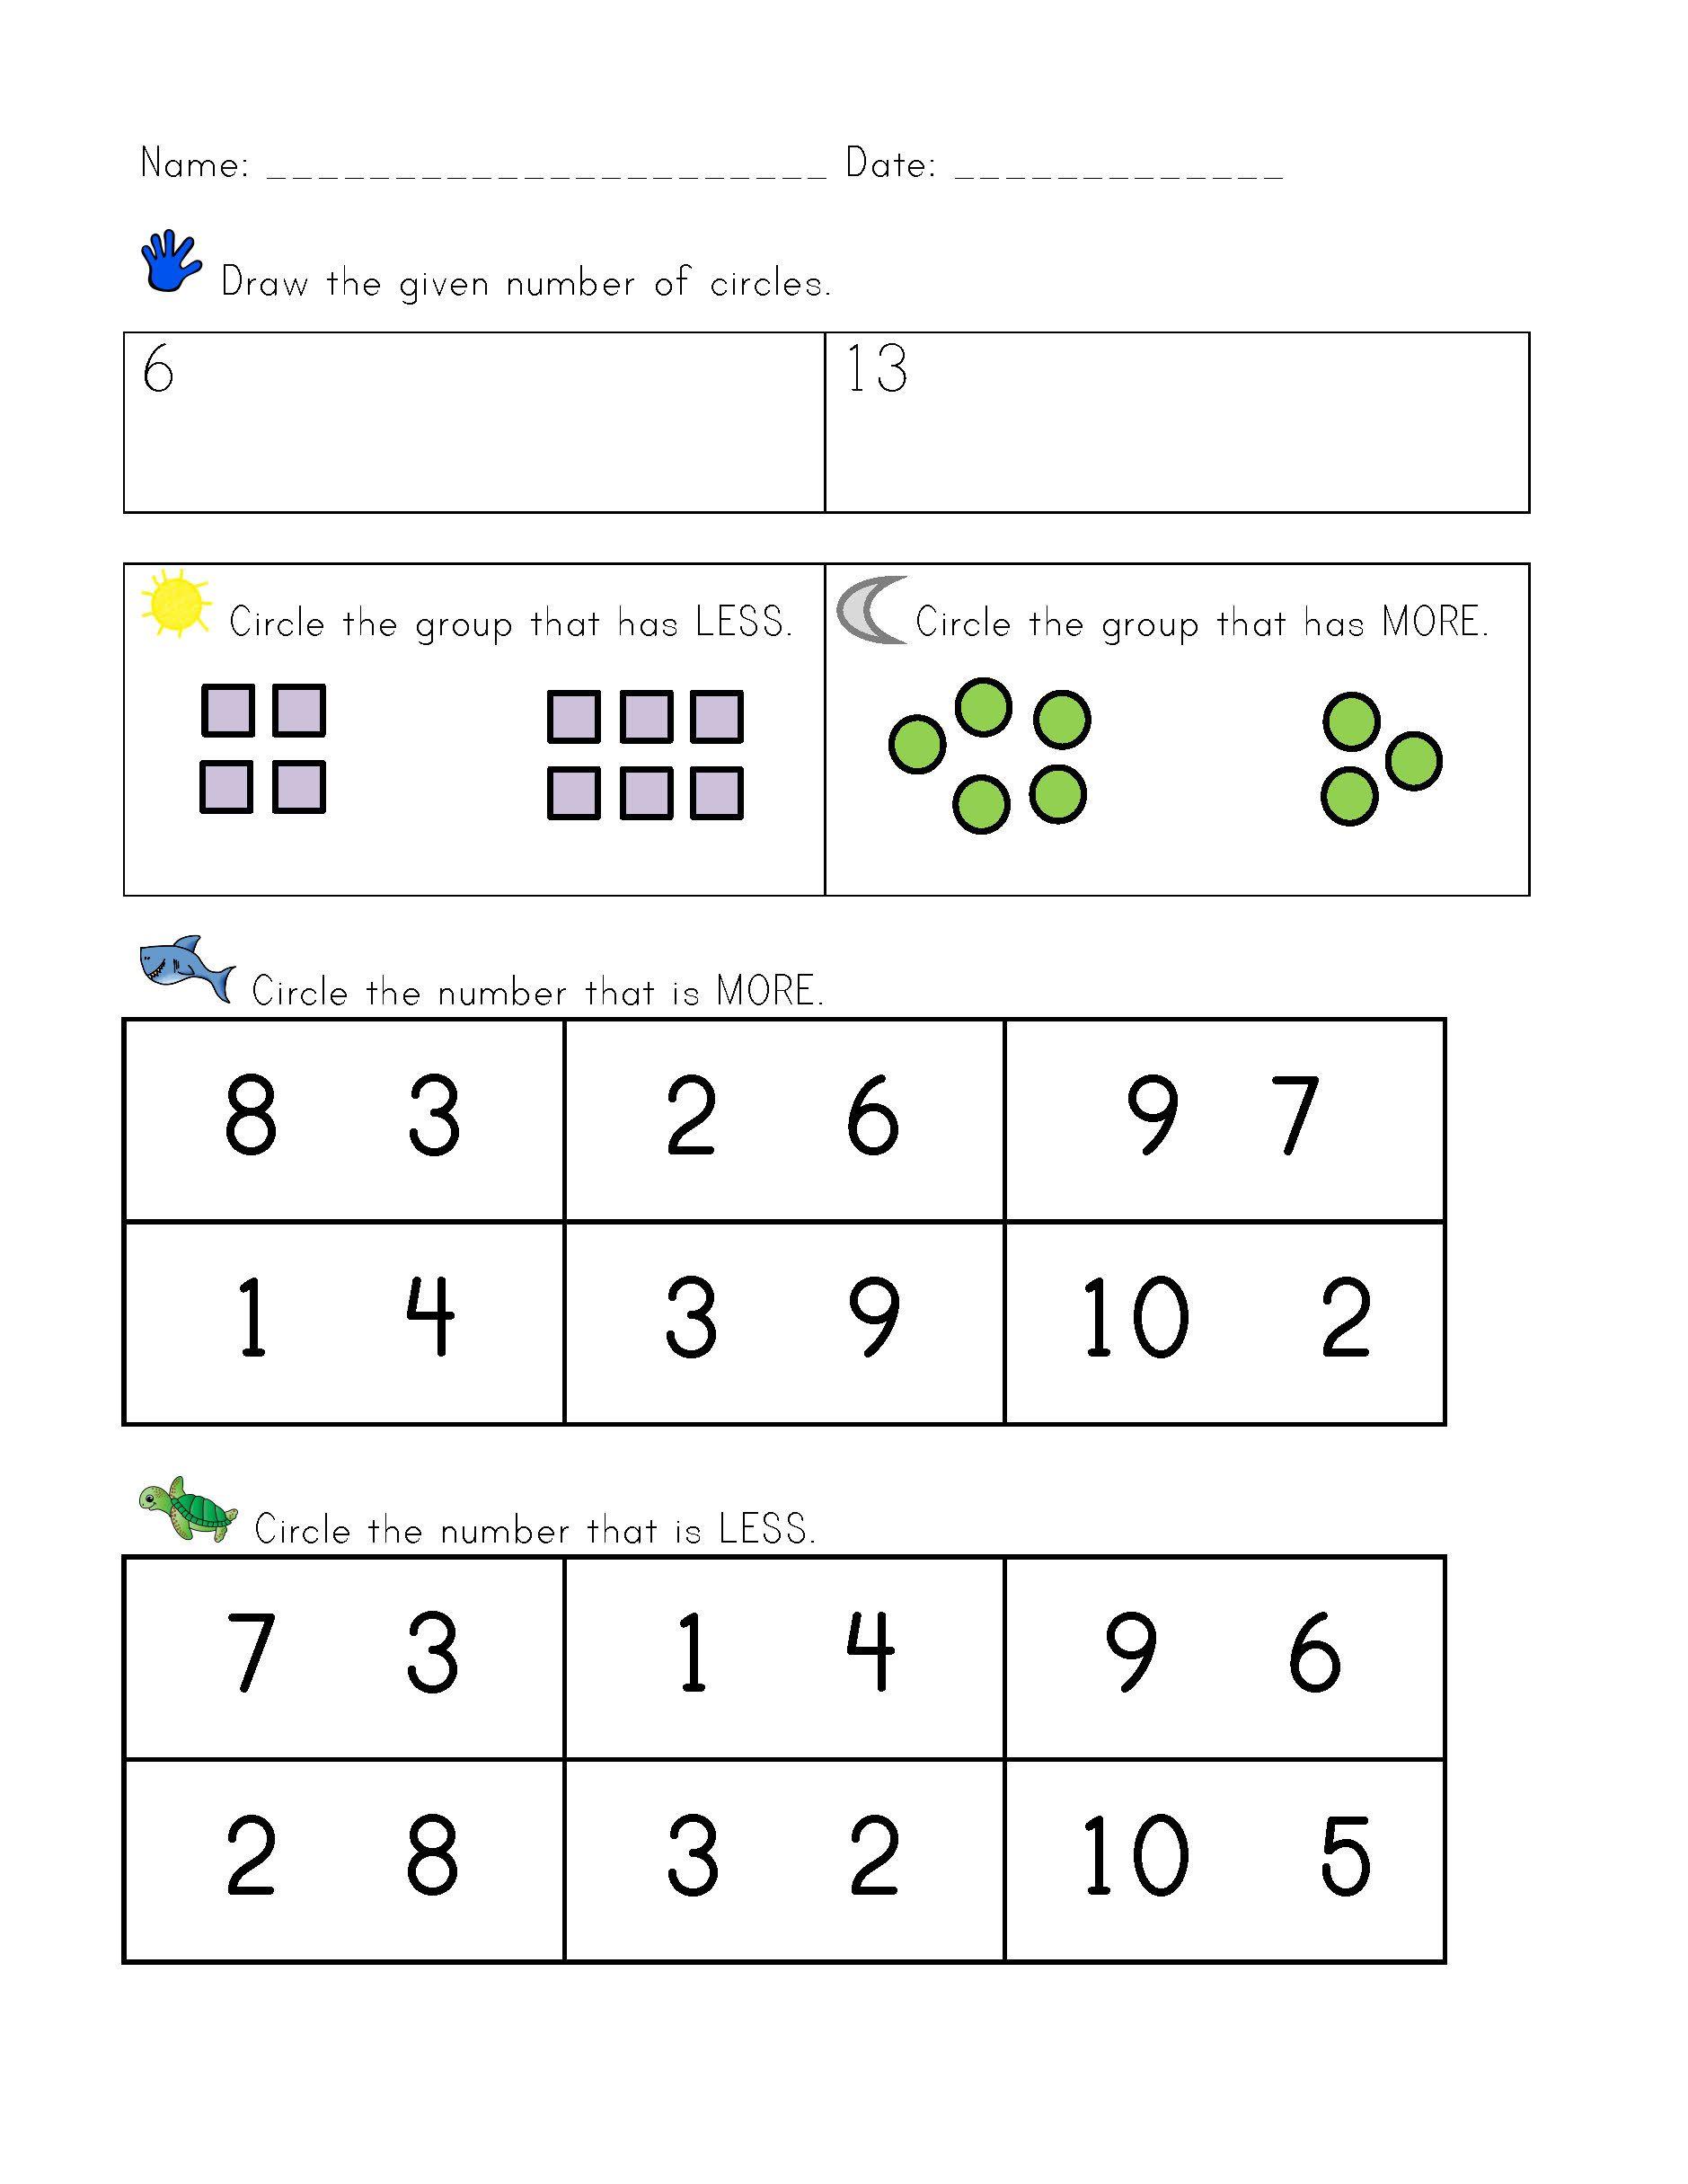 Kindergarten Ccss Math Assessments Counting And Cardinality Kindergarten Math Worksheets Addition Math Addition Worksheets Math Assessment [ 2431 x 1879 Pixel ]